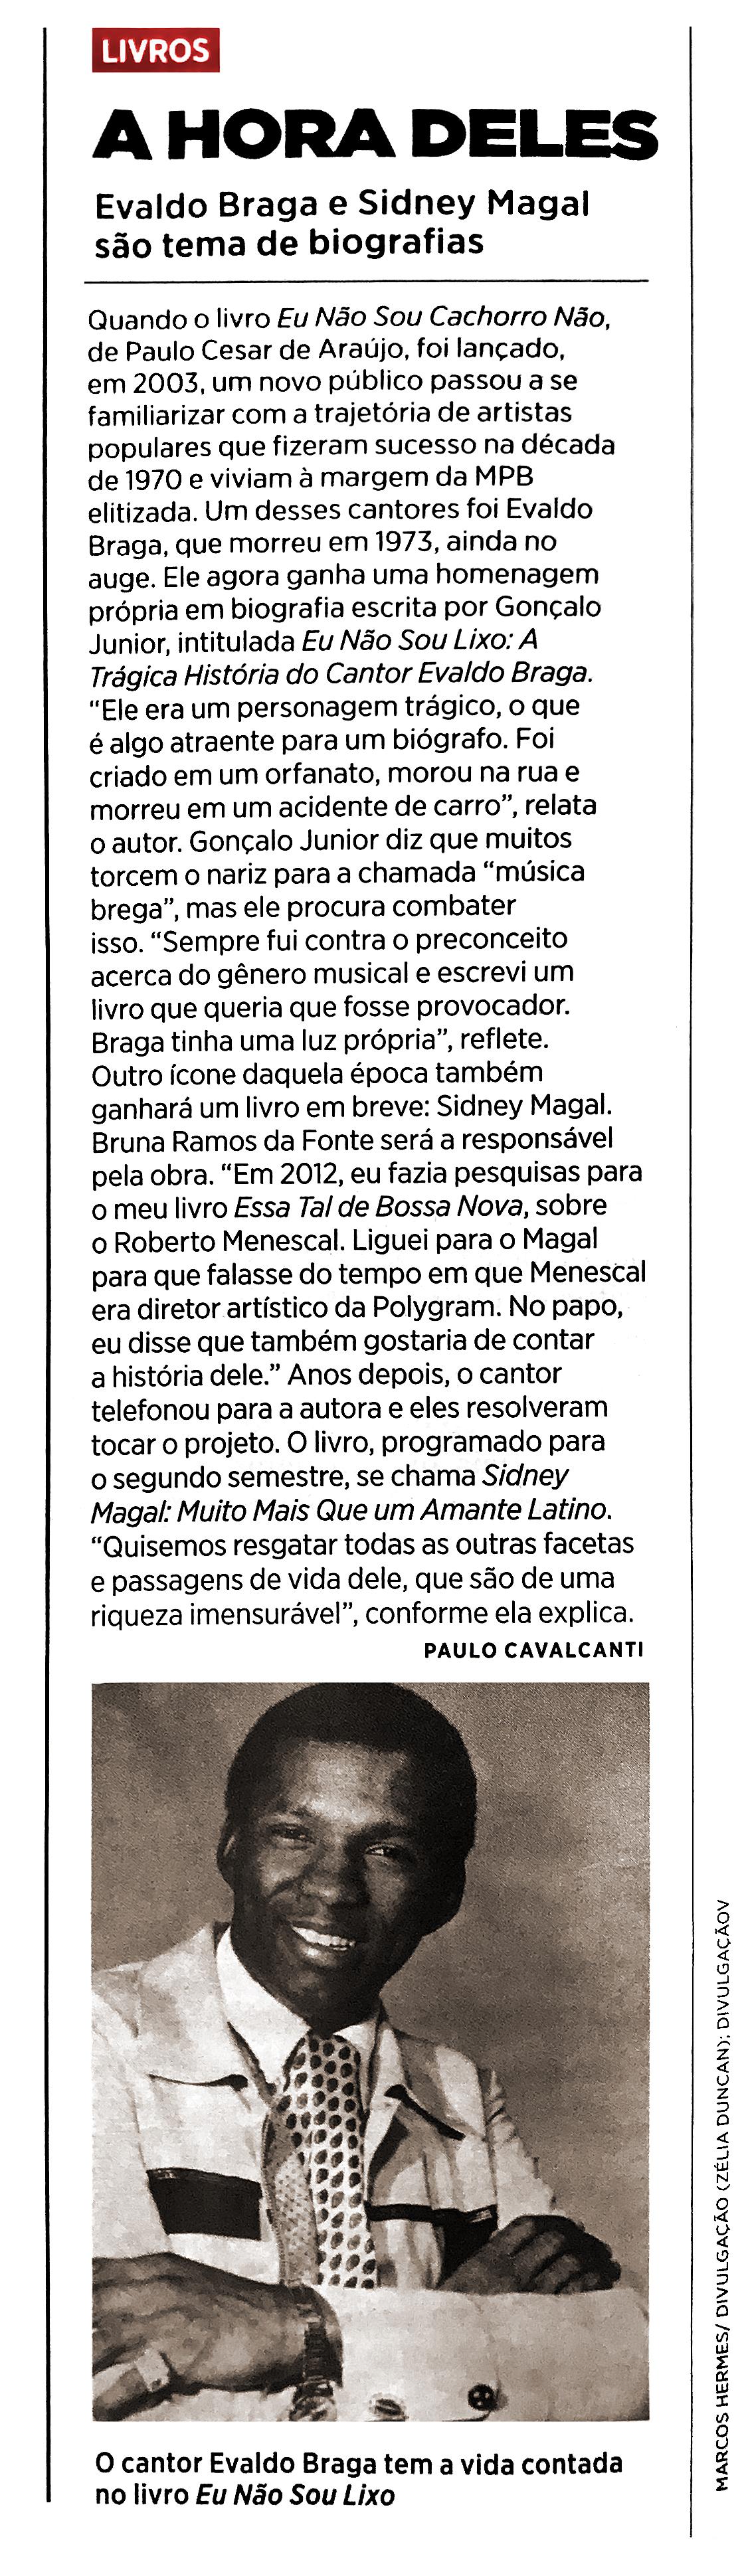 Rolling Stone  São Paulo –23/6/17